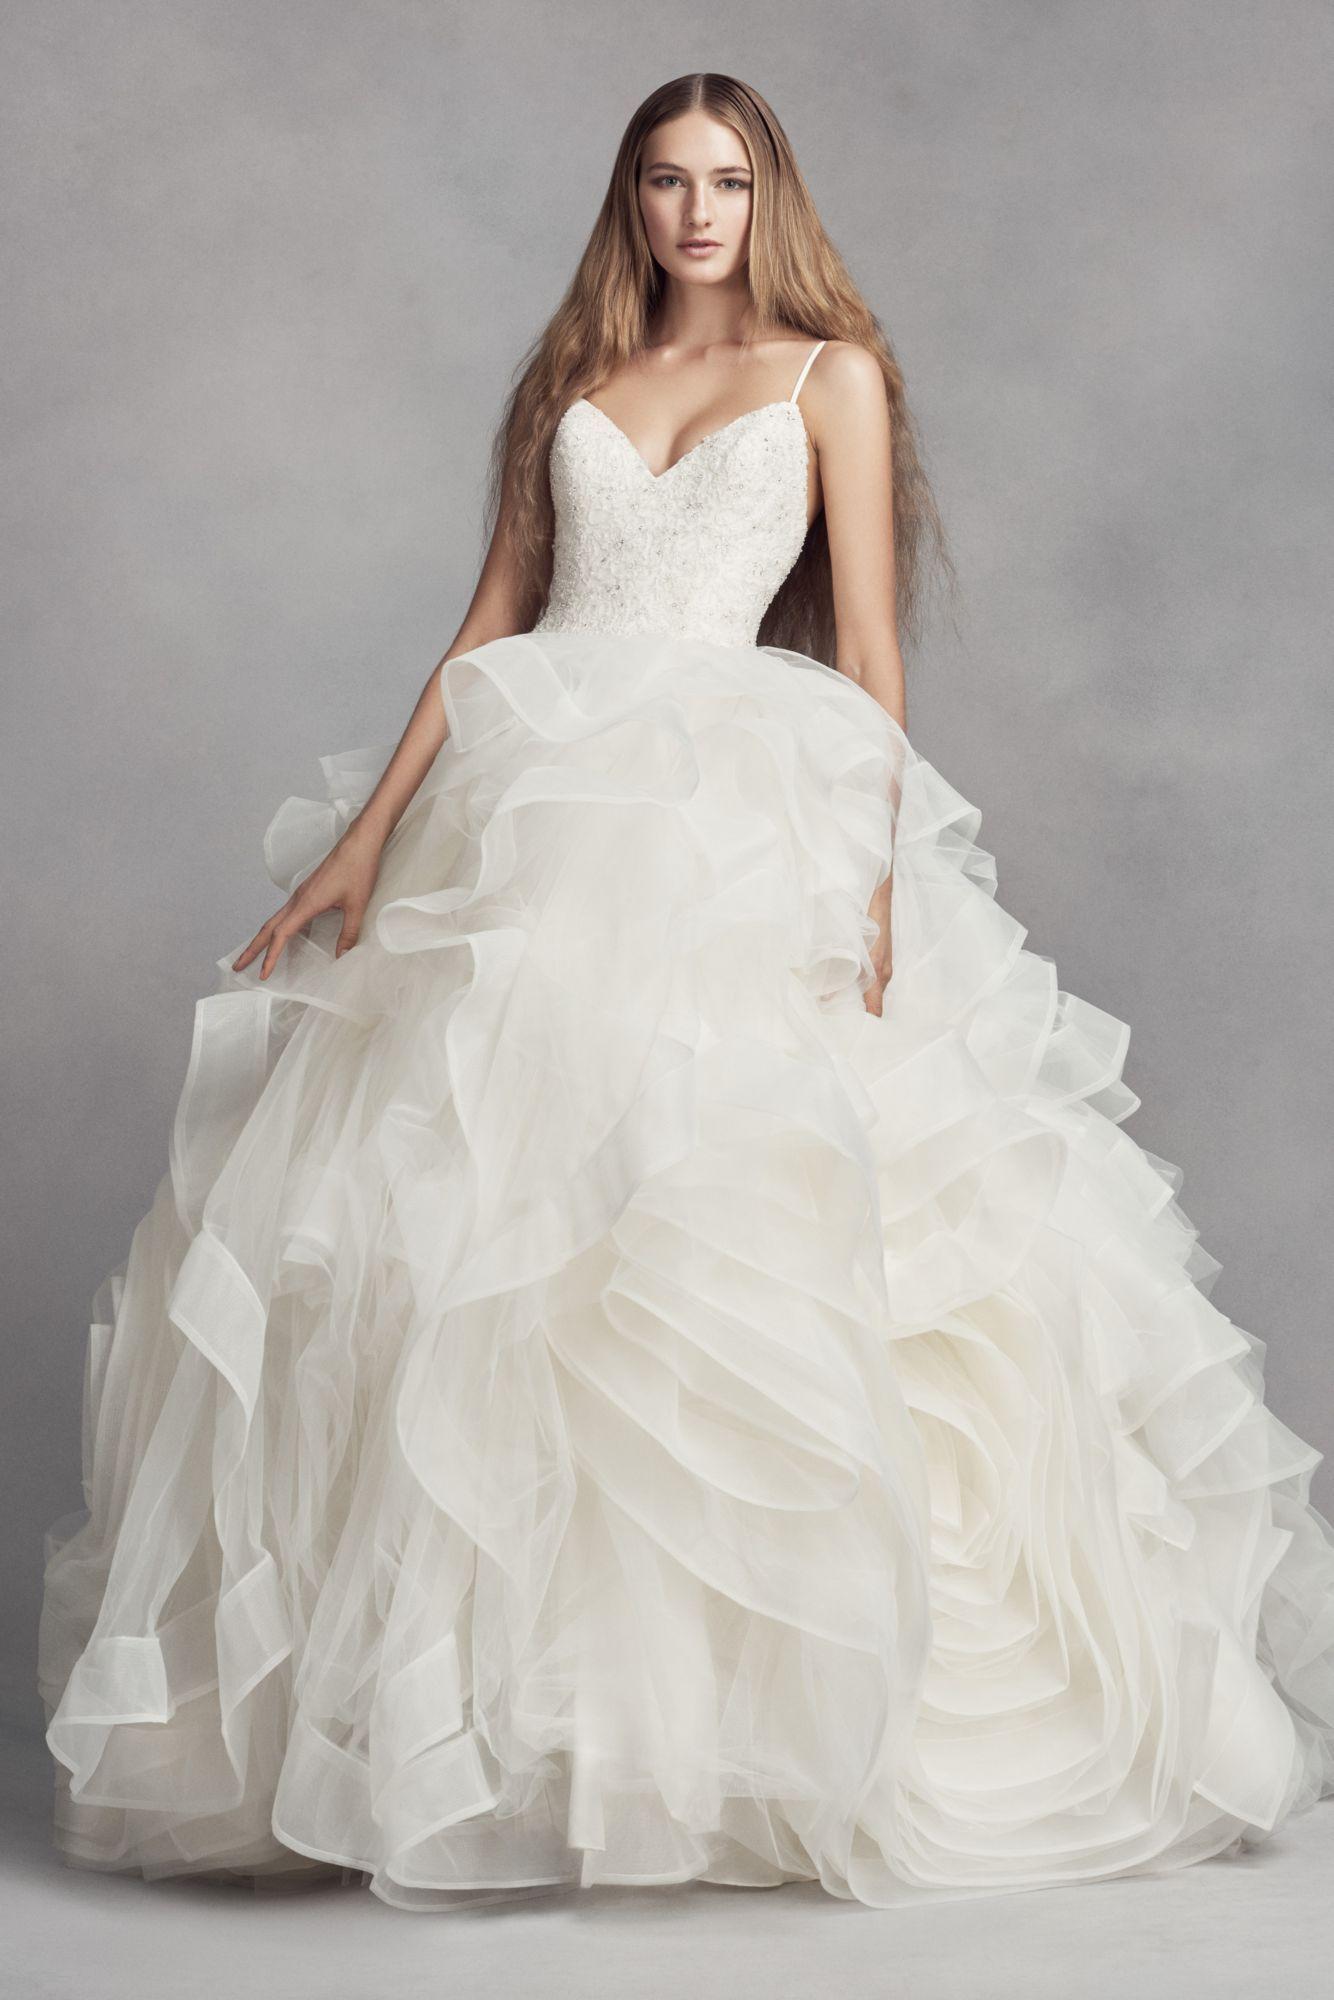 White By Vera Wan Spaghetti Straps Floor Length Organza Rosette Skirt Wedding Dress Vw35 Wedding Dress Organza Davids Bridal Wedding Dresses Ball Gowns Wedding